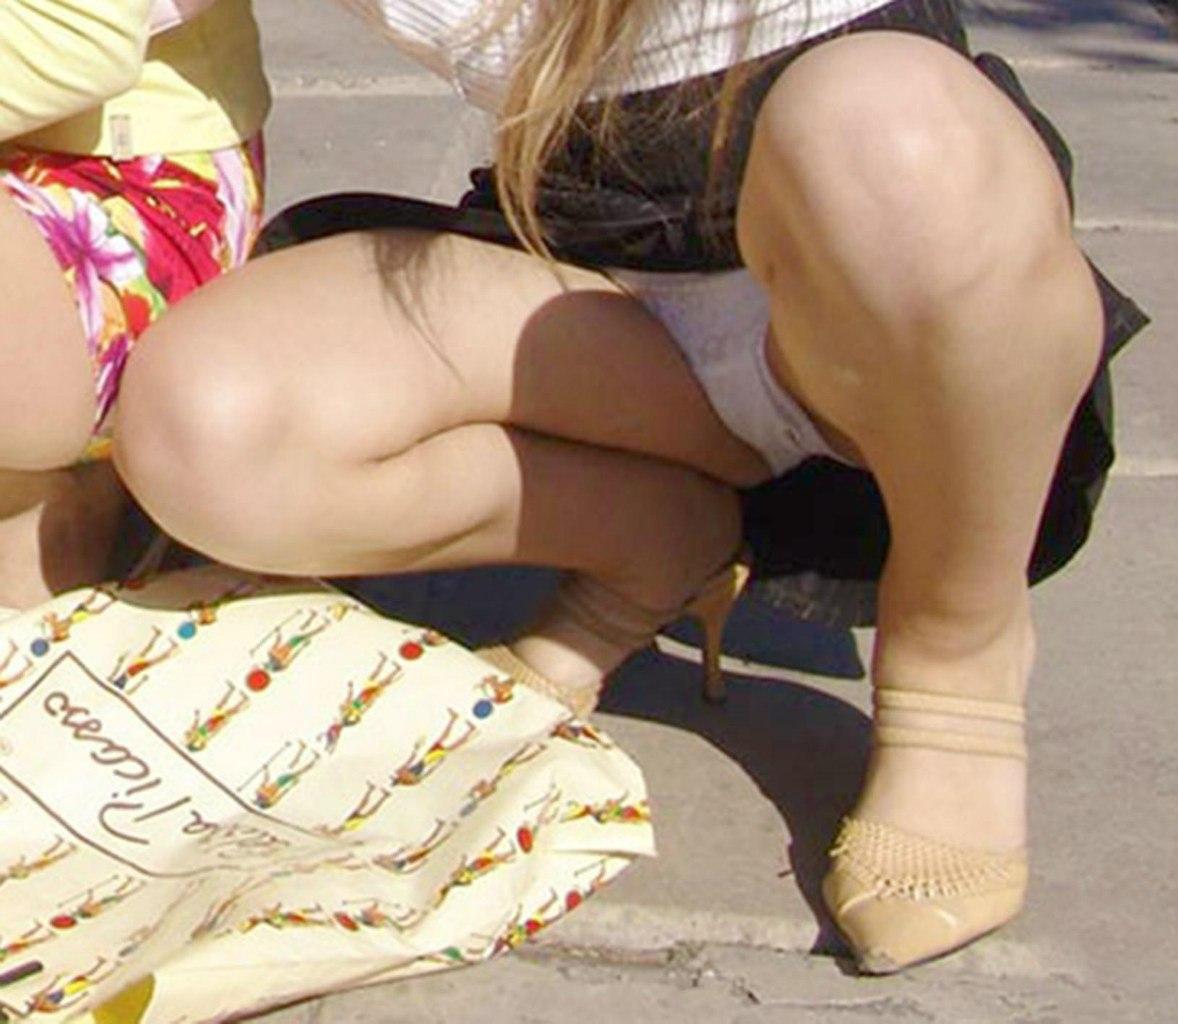 Попки в контакте из под юбки